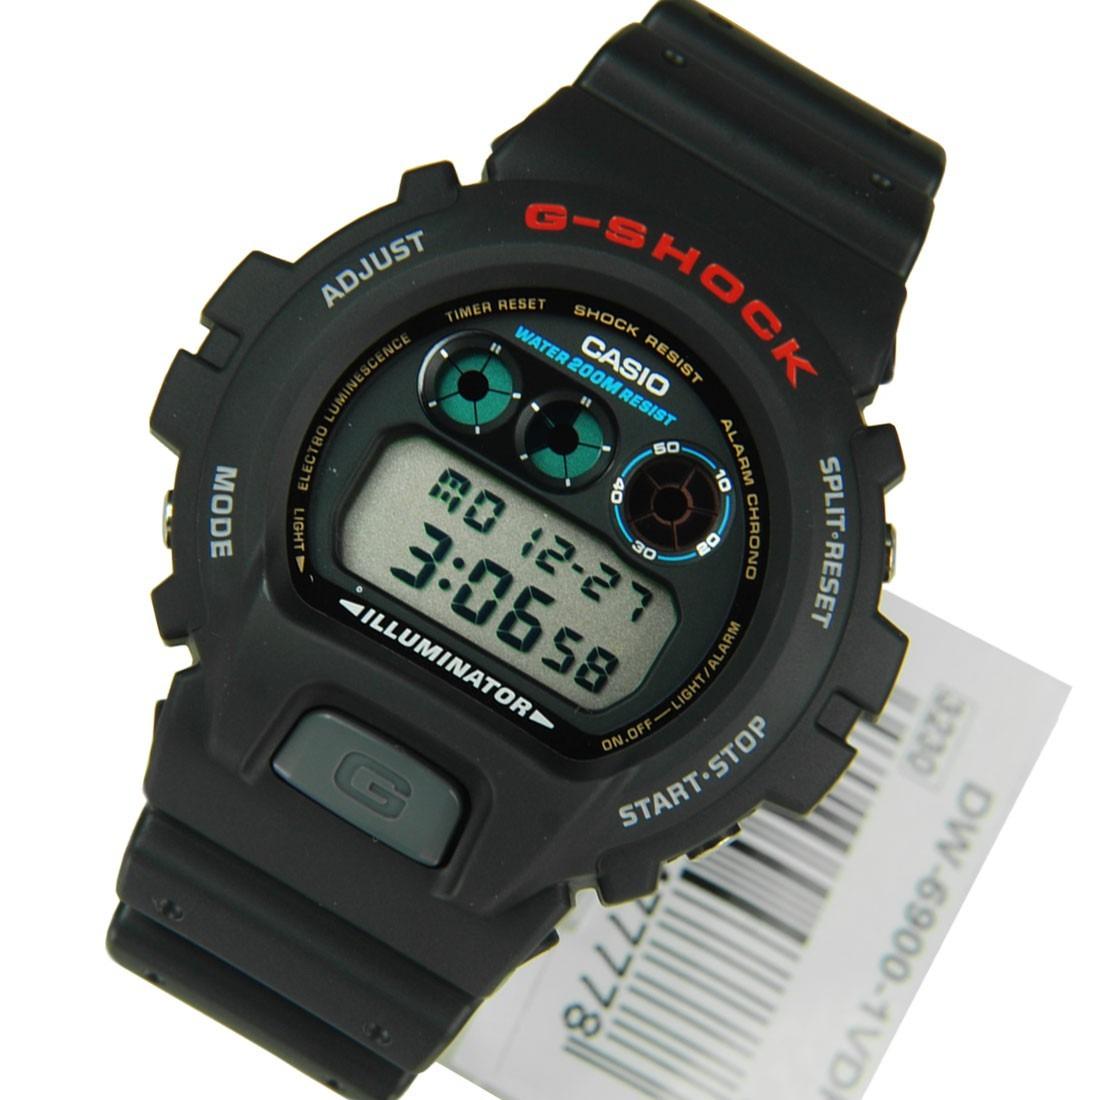 b3b7f2faba6 relógio casio - g-shock - dw-6900-1vdr. Carregando zoom.